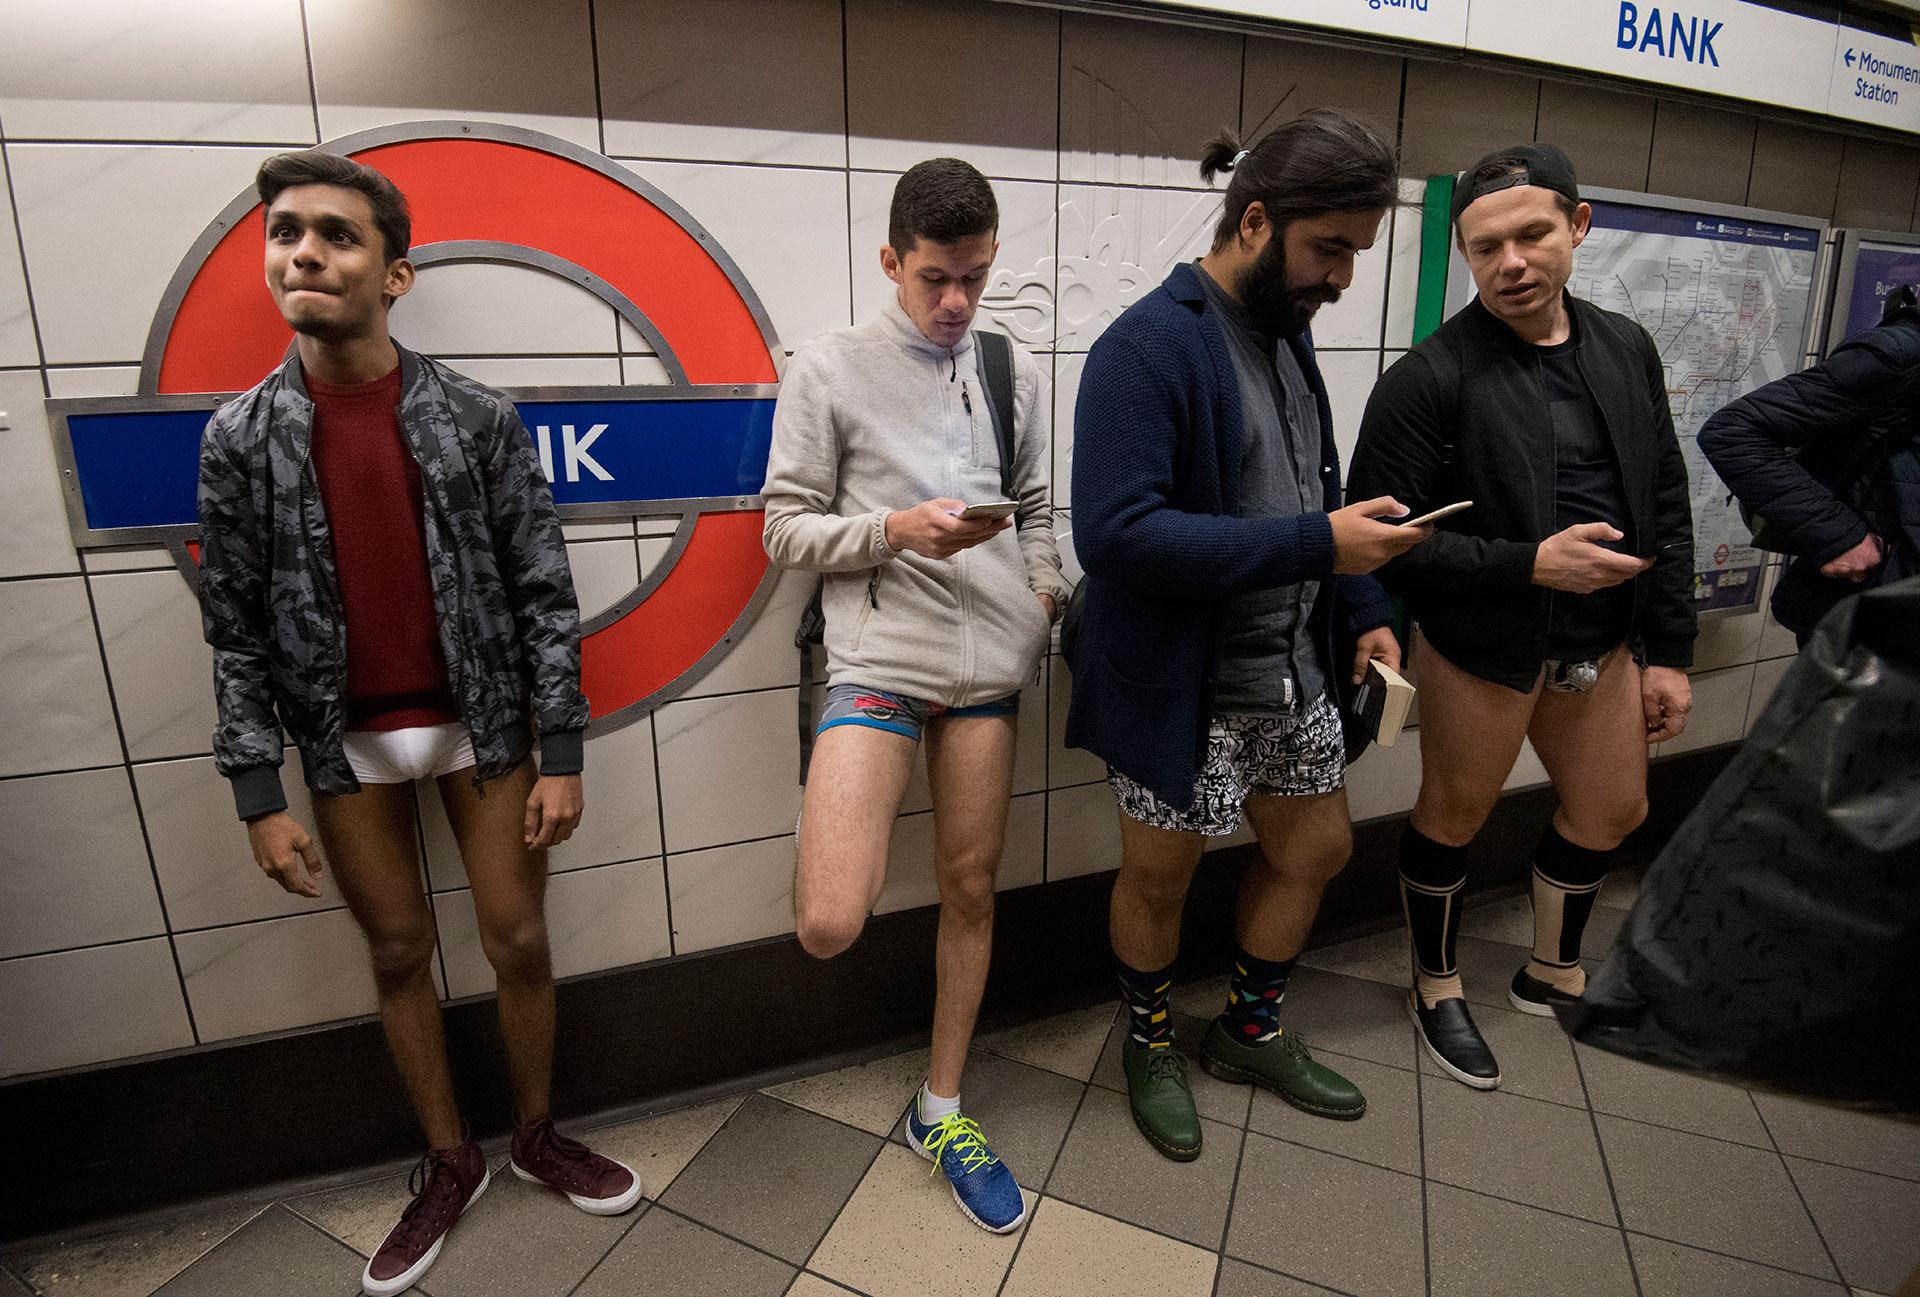 Londres (AFP)